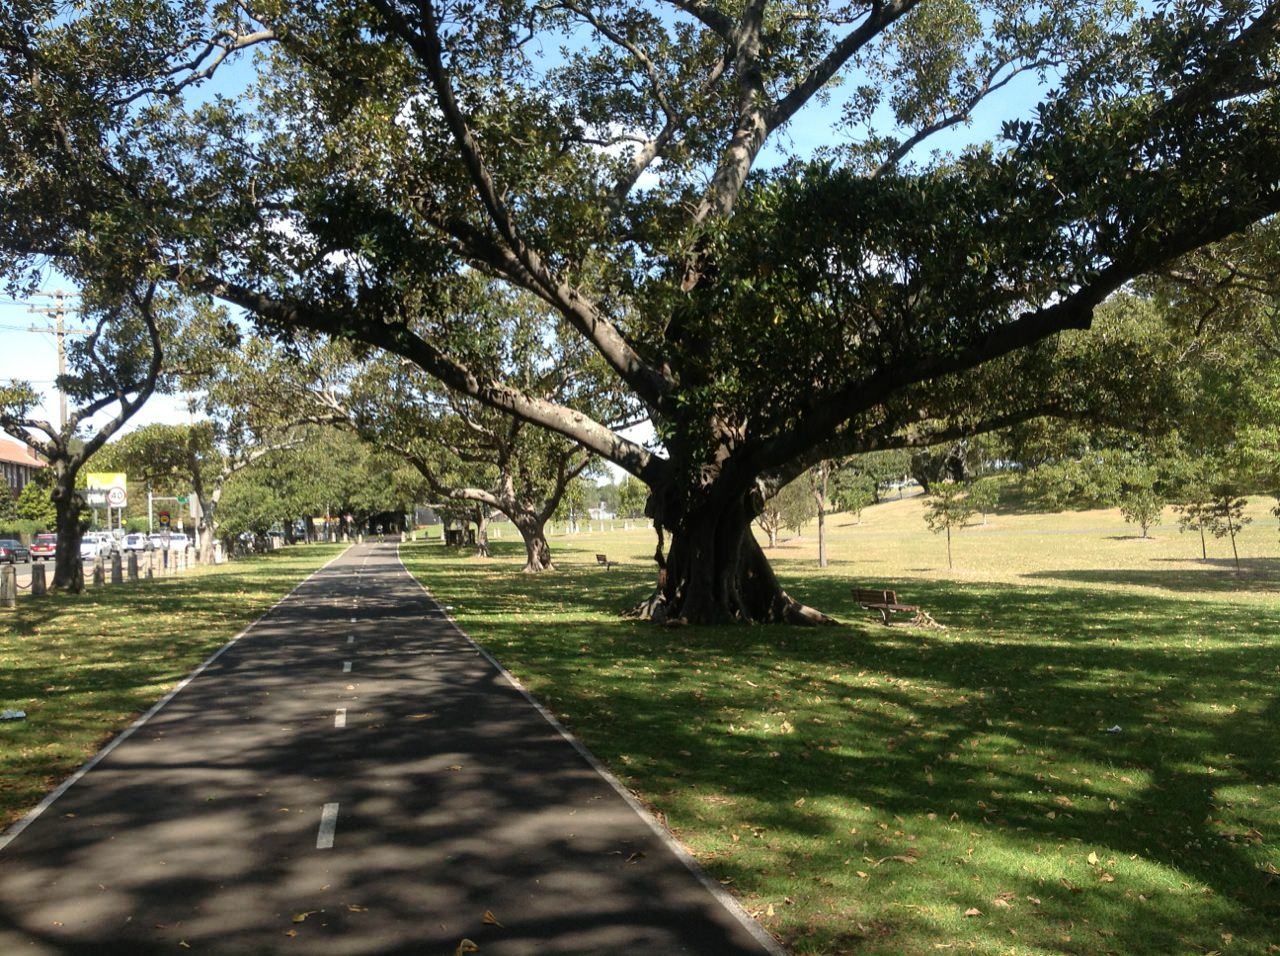 Moreton Bay and Port Jackson Figs